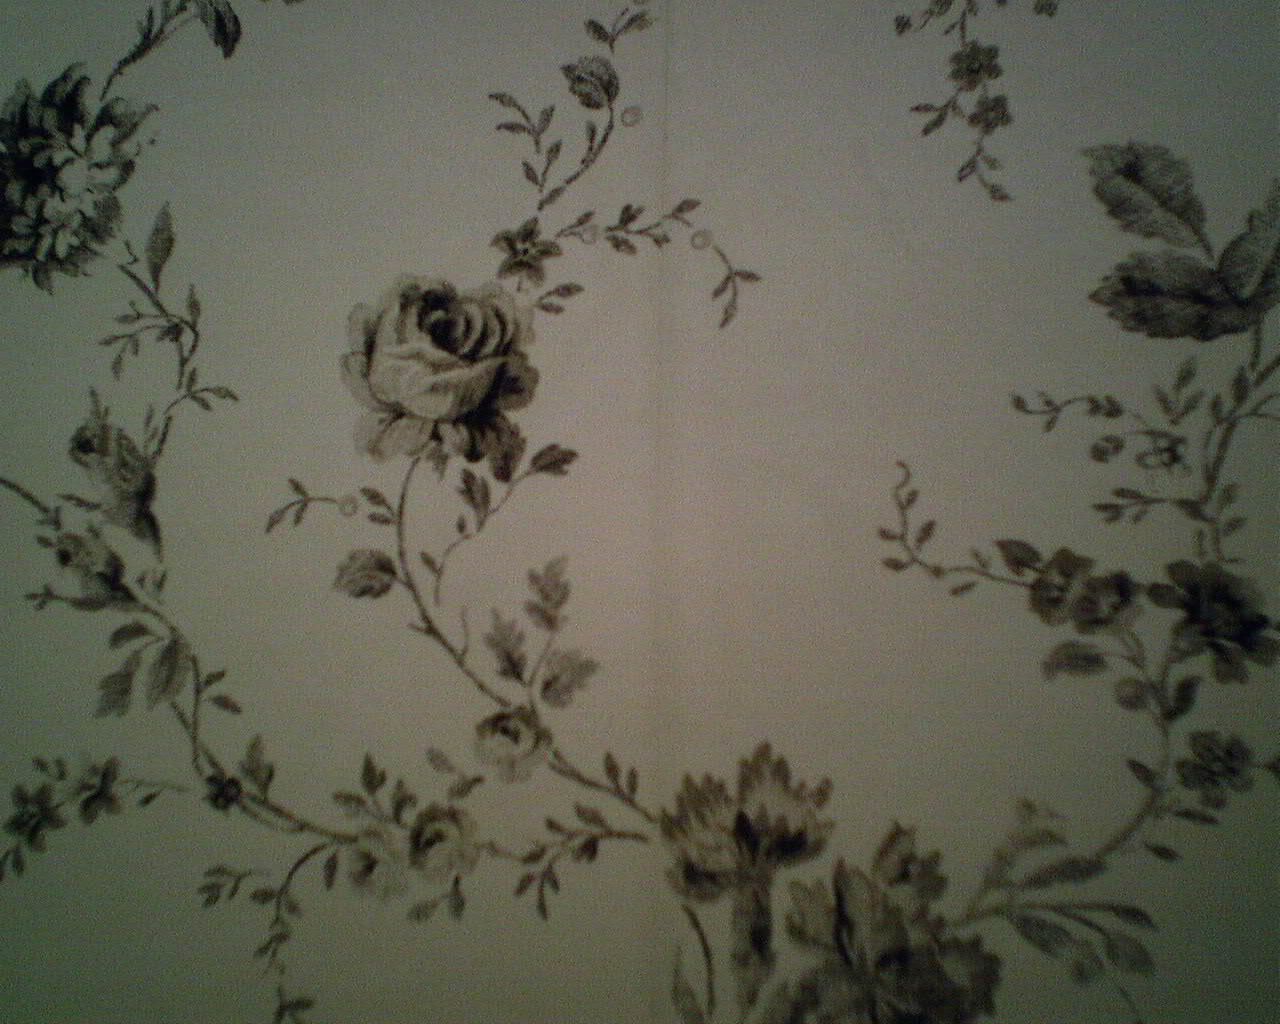 hgtv wallpaper sherwin williams 1280x1024